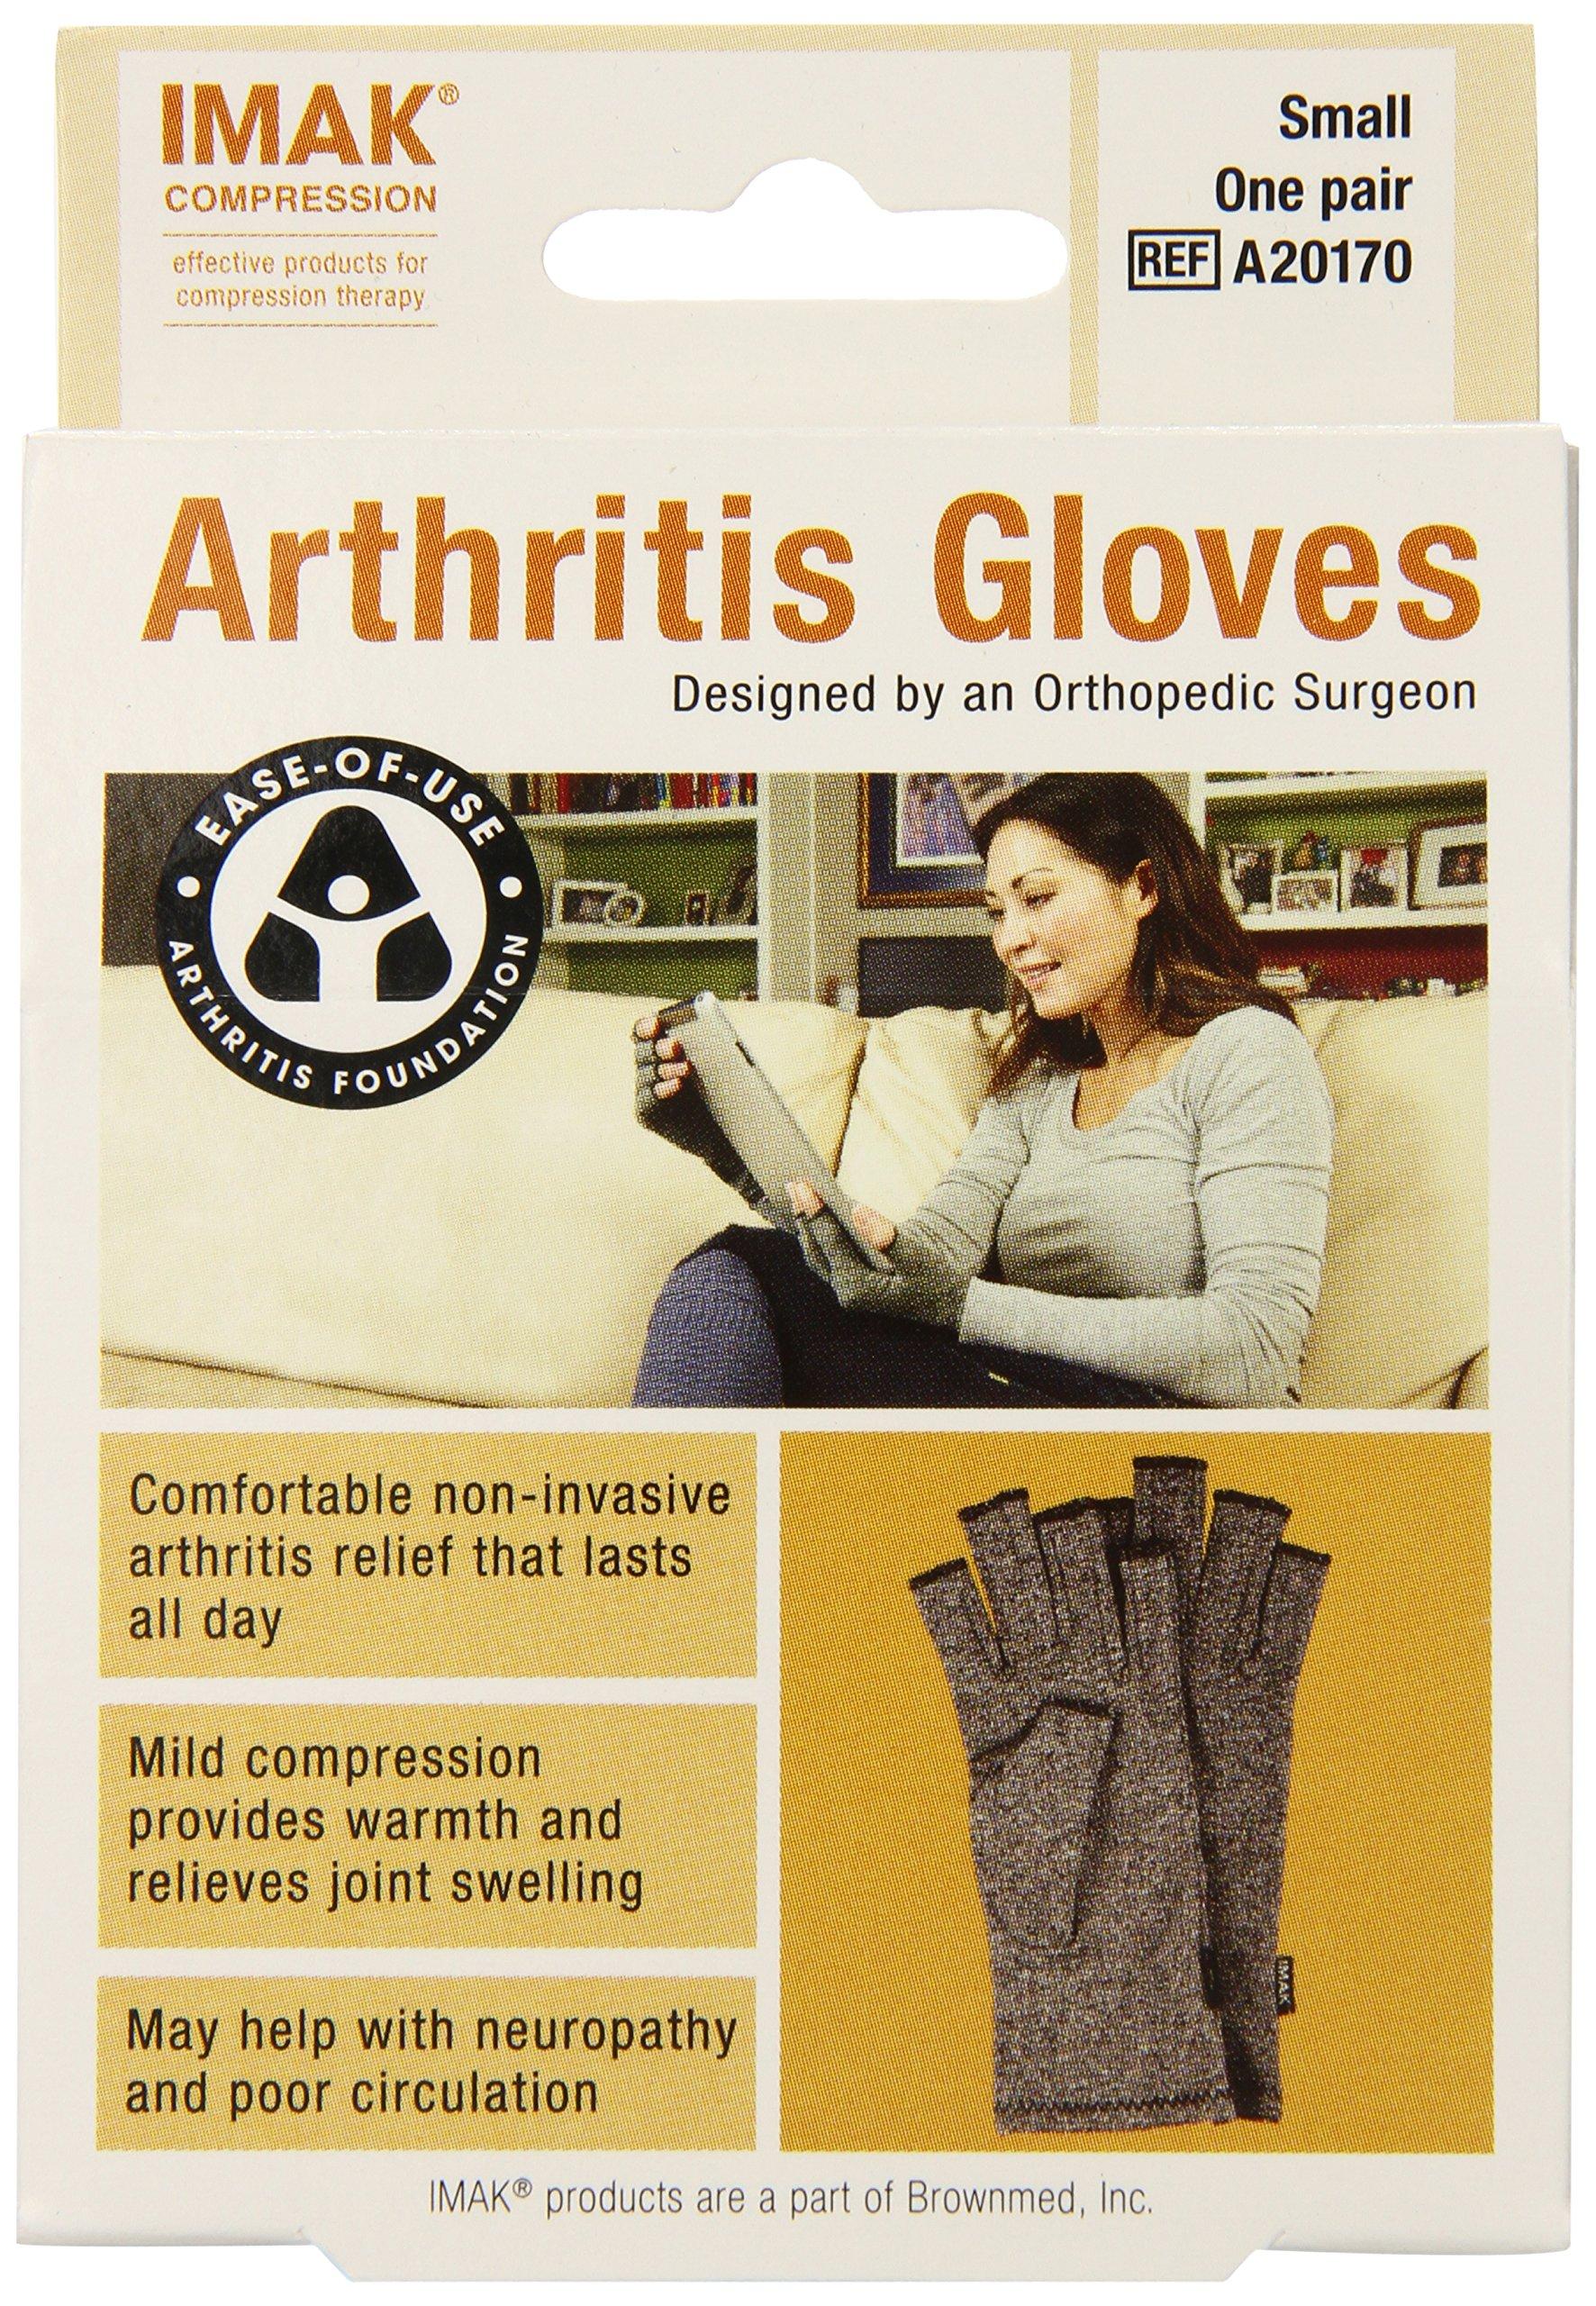 IMAK Compression Arthritis Gloves, Original with Arthritis Foundation Ease of Use Seal, Small